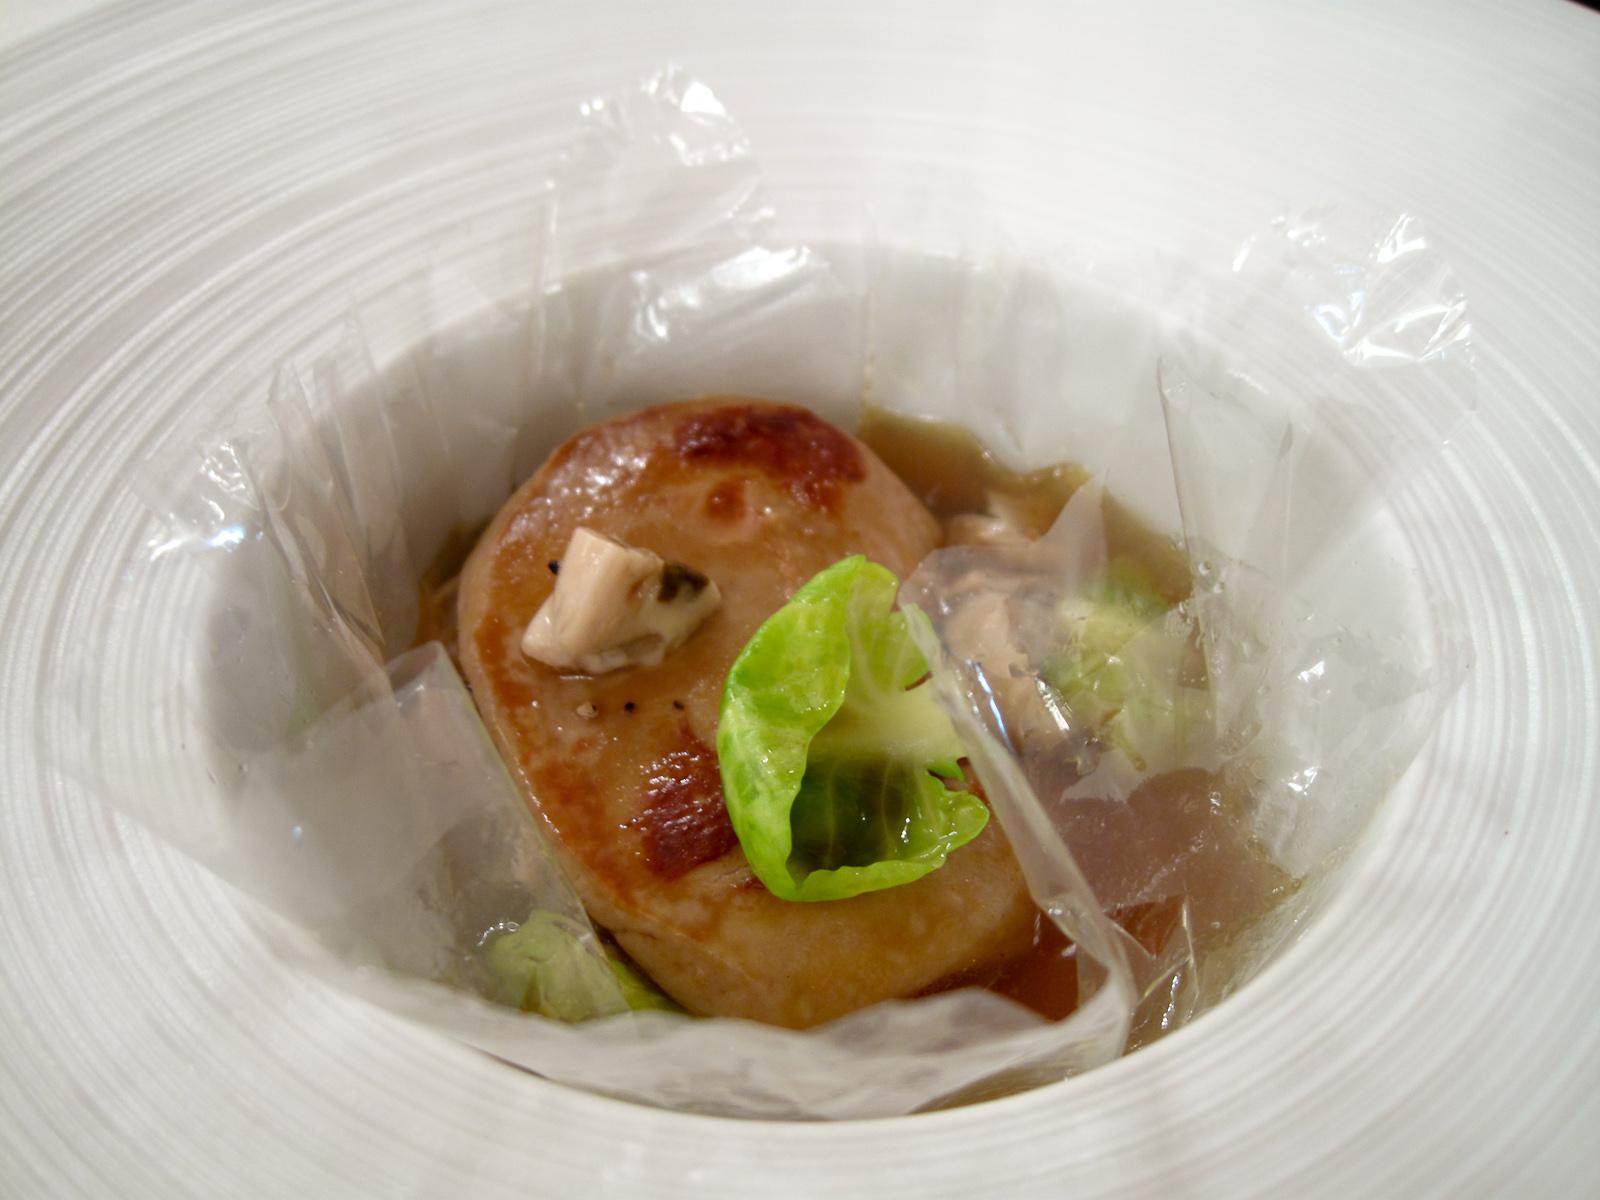 Le Bristol - Foie gras de canard